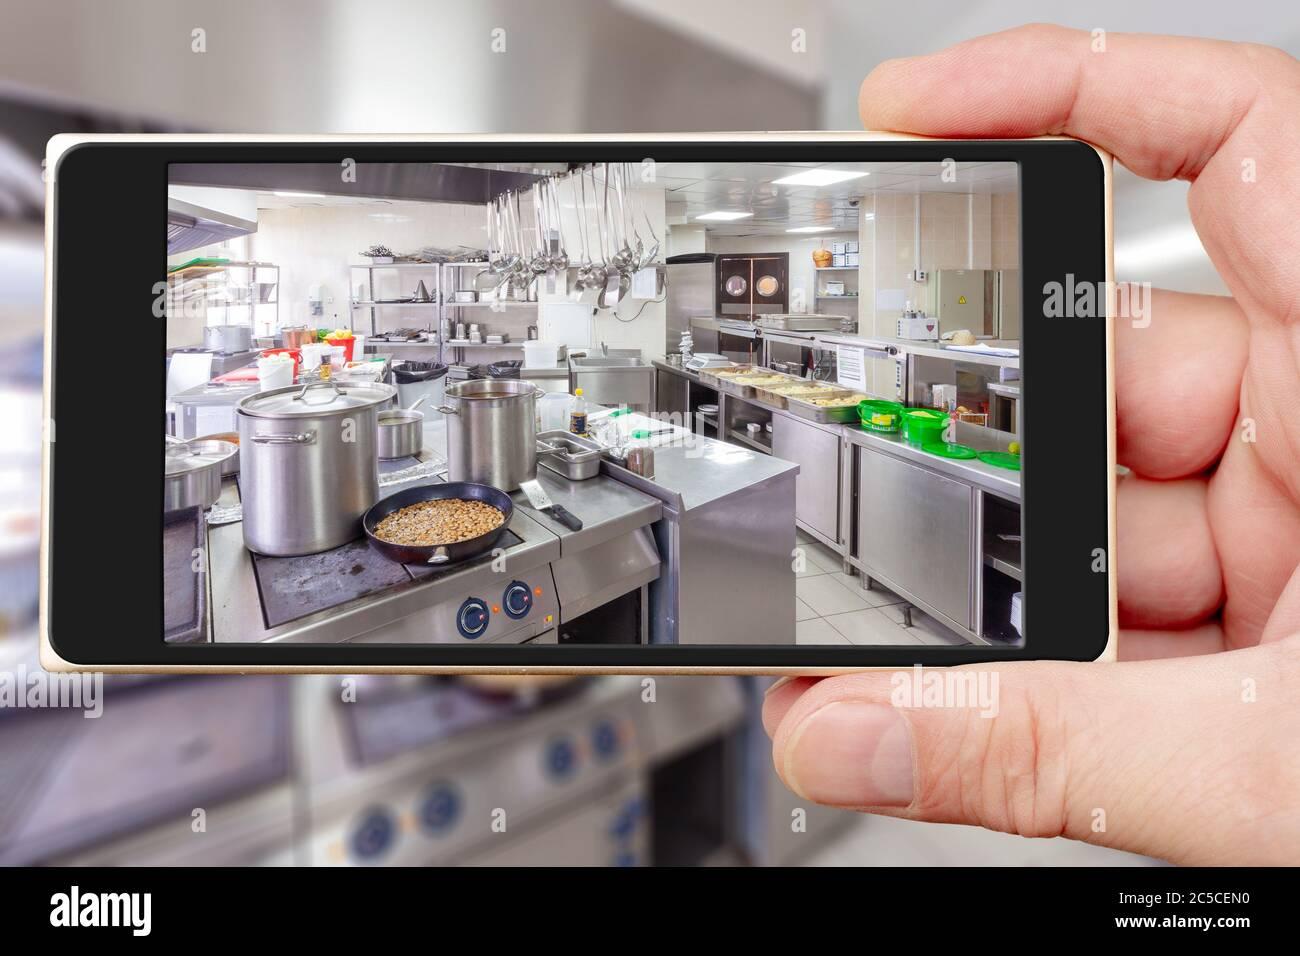 Restaurant Kitchen On Smartphone Screen Chrome Kitchen Equipment Cafe Stock Photo Alamy